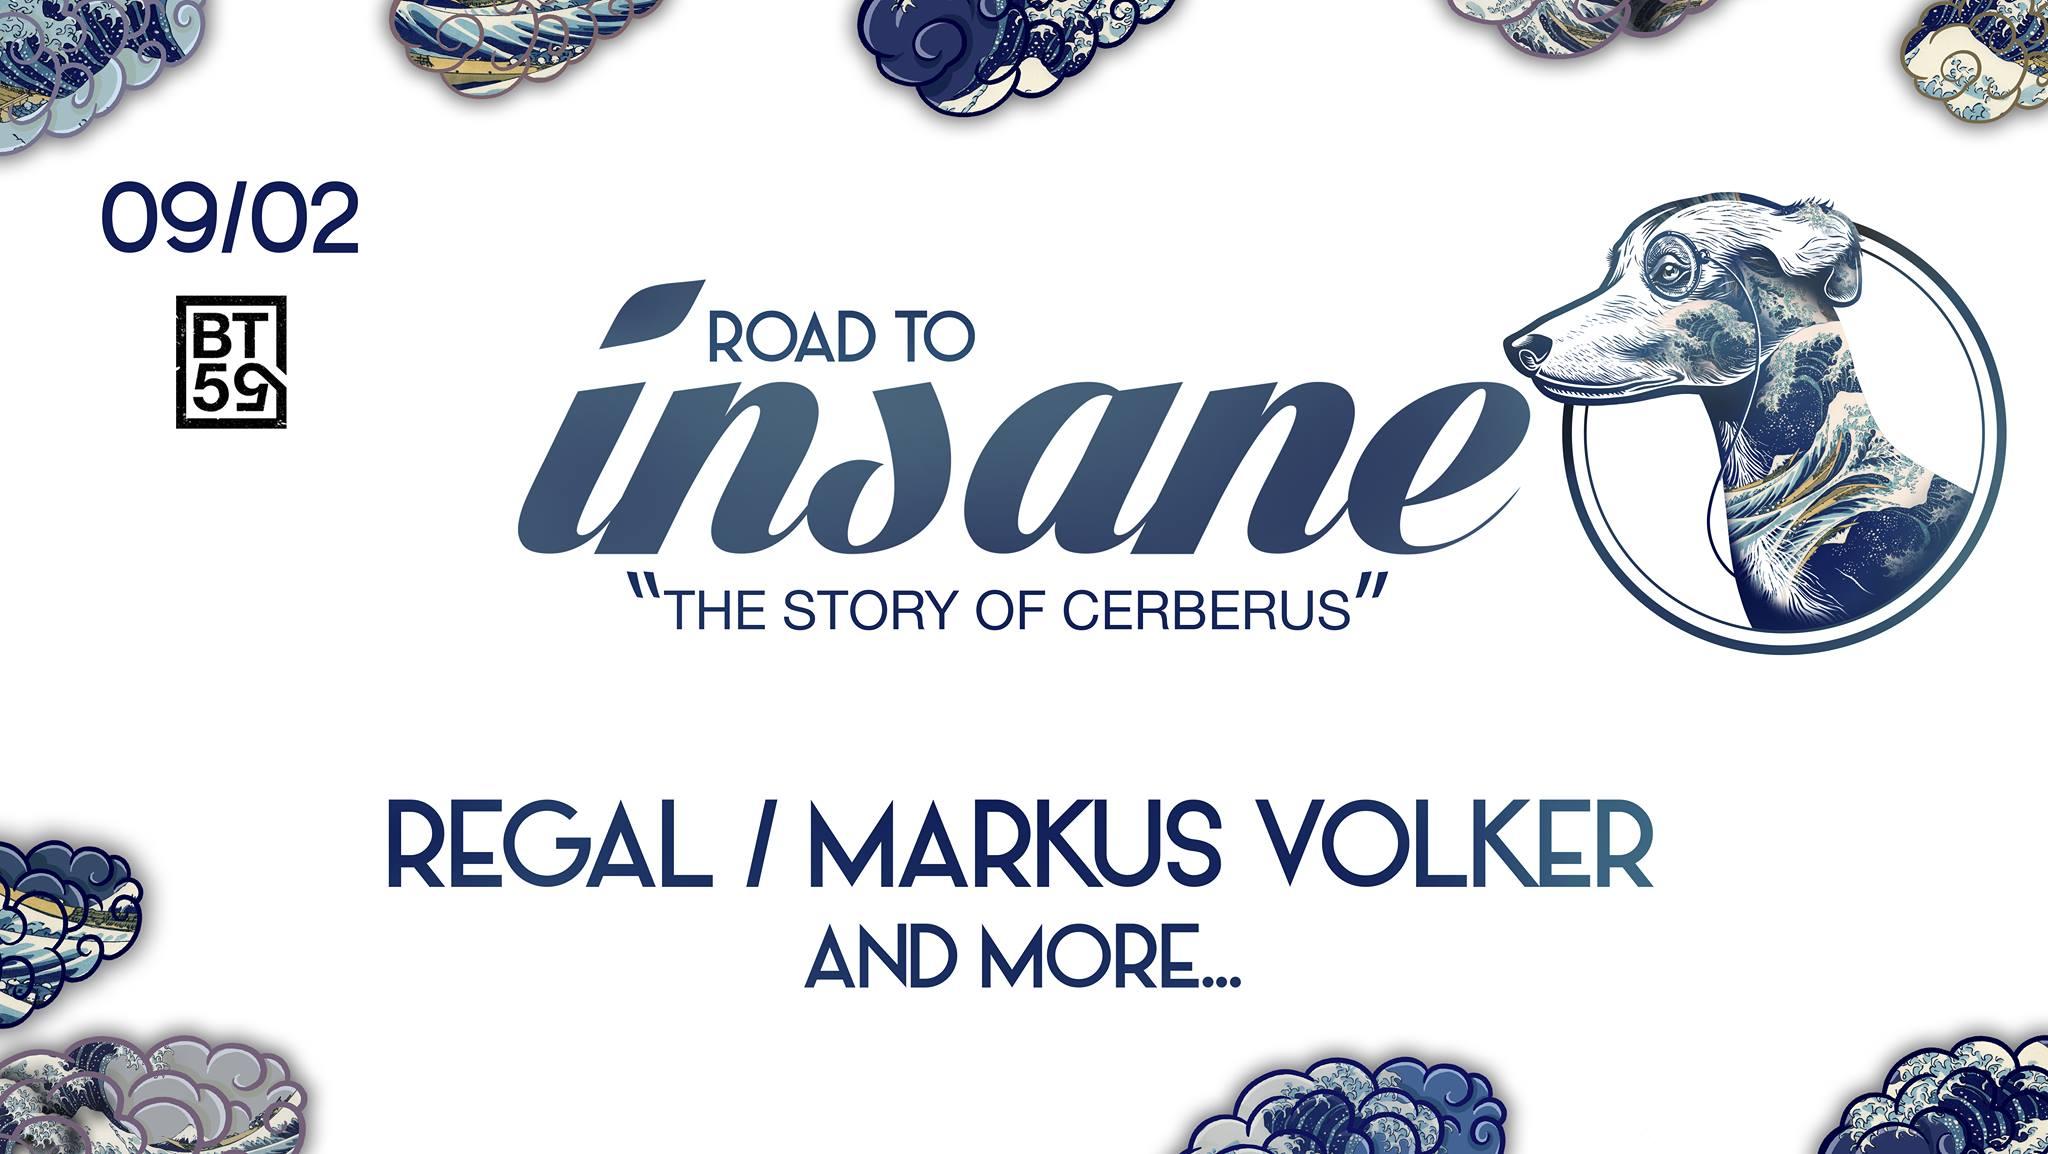 Road To Insane - w/ Regal, Markus Volker - BT59